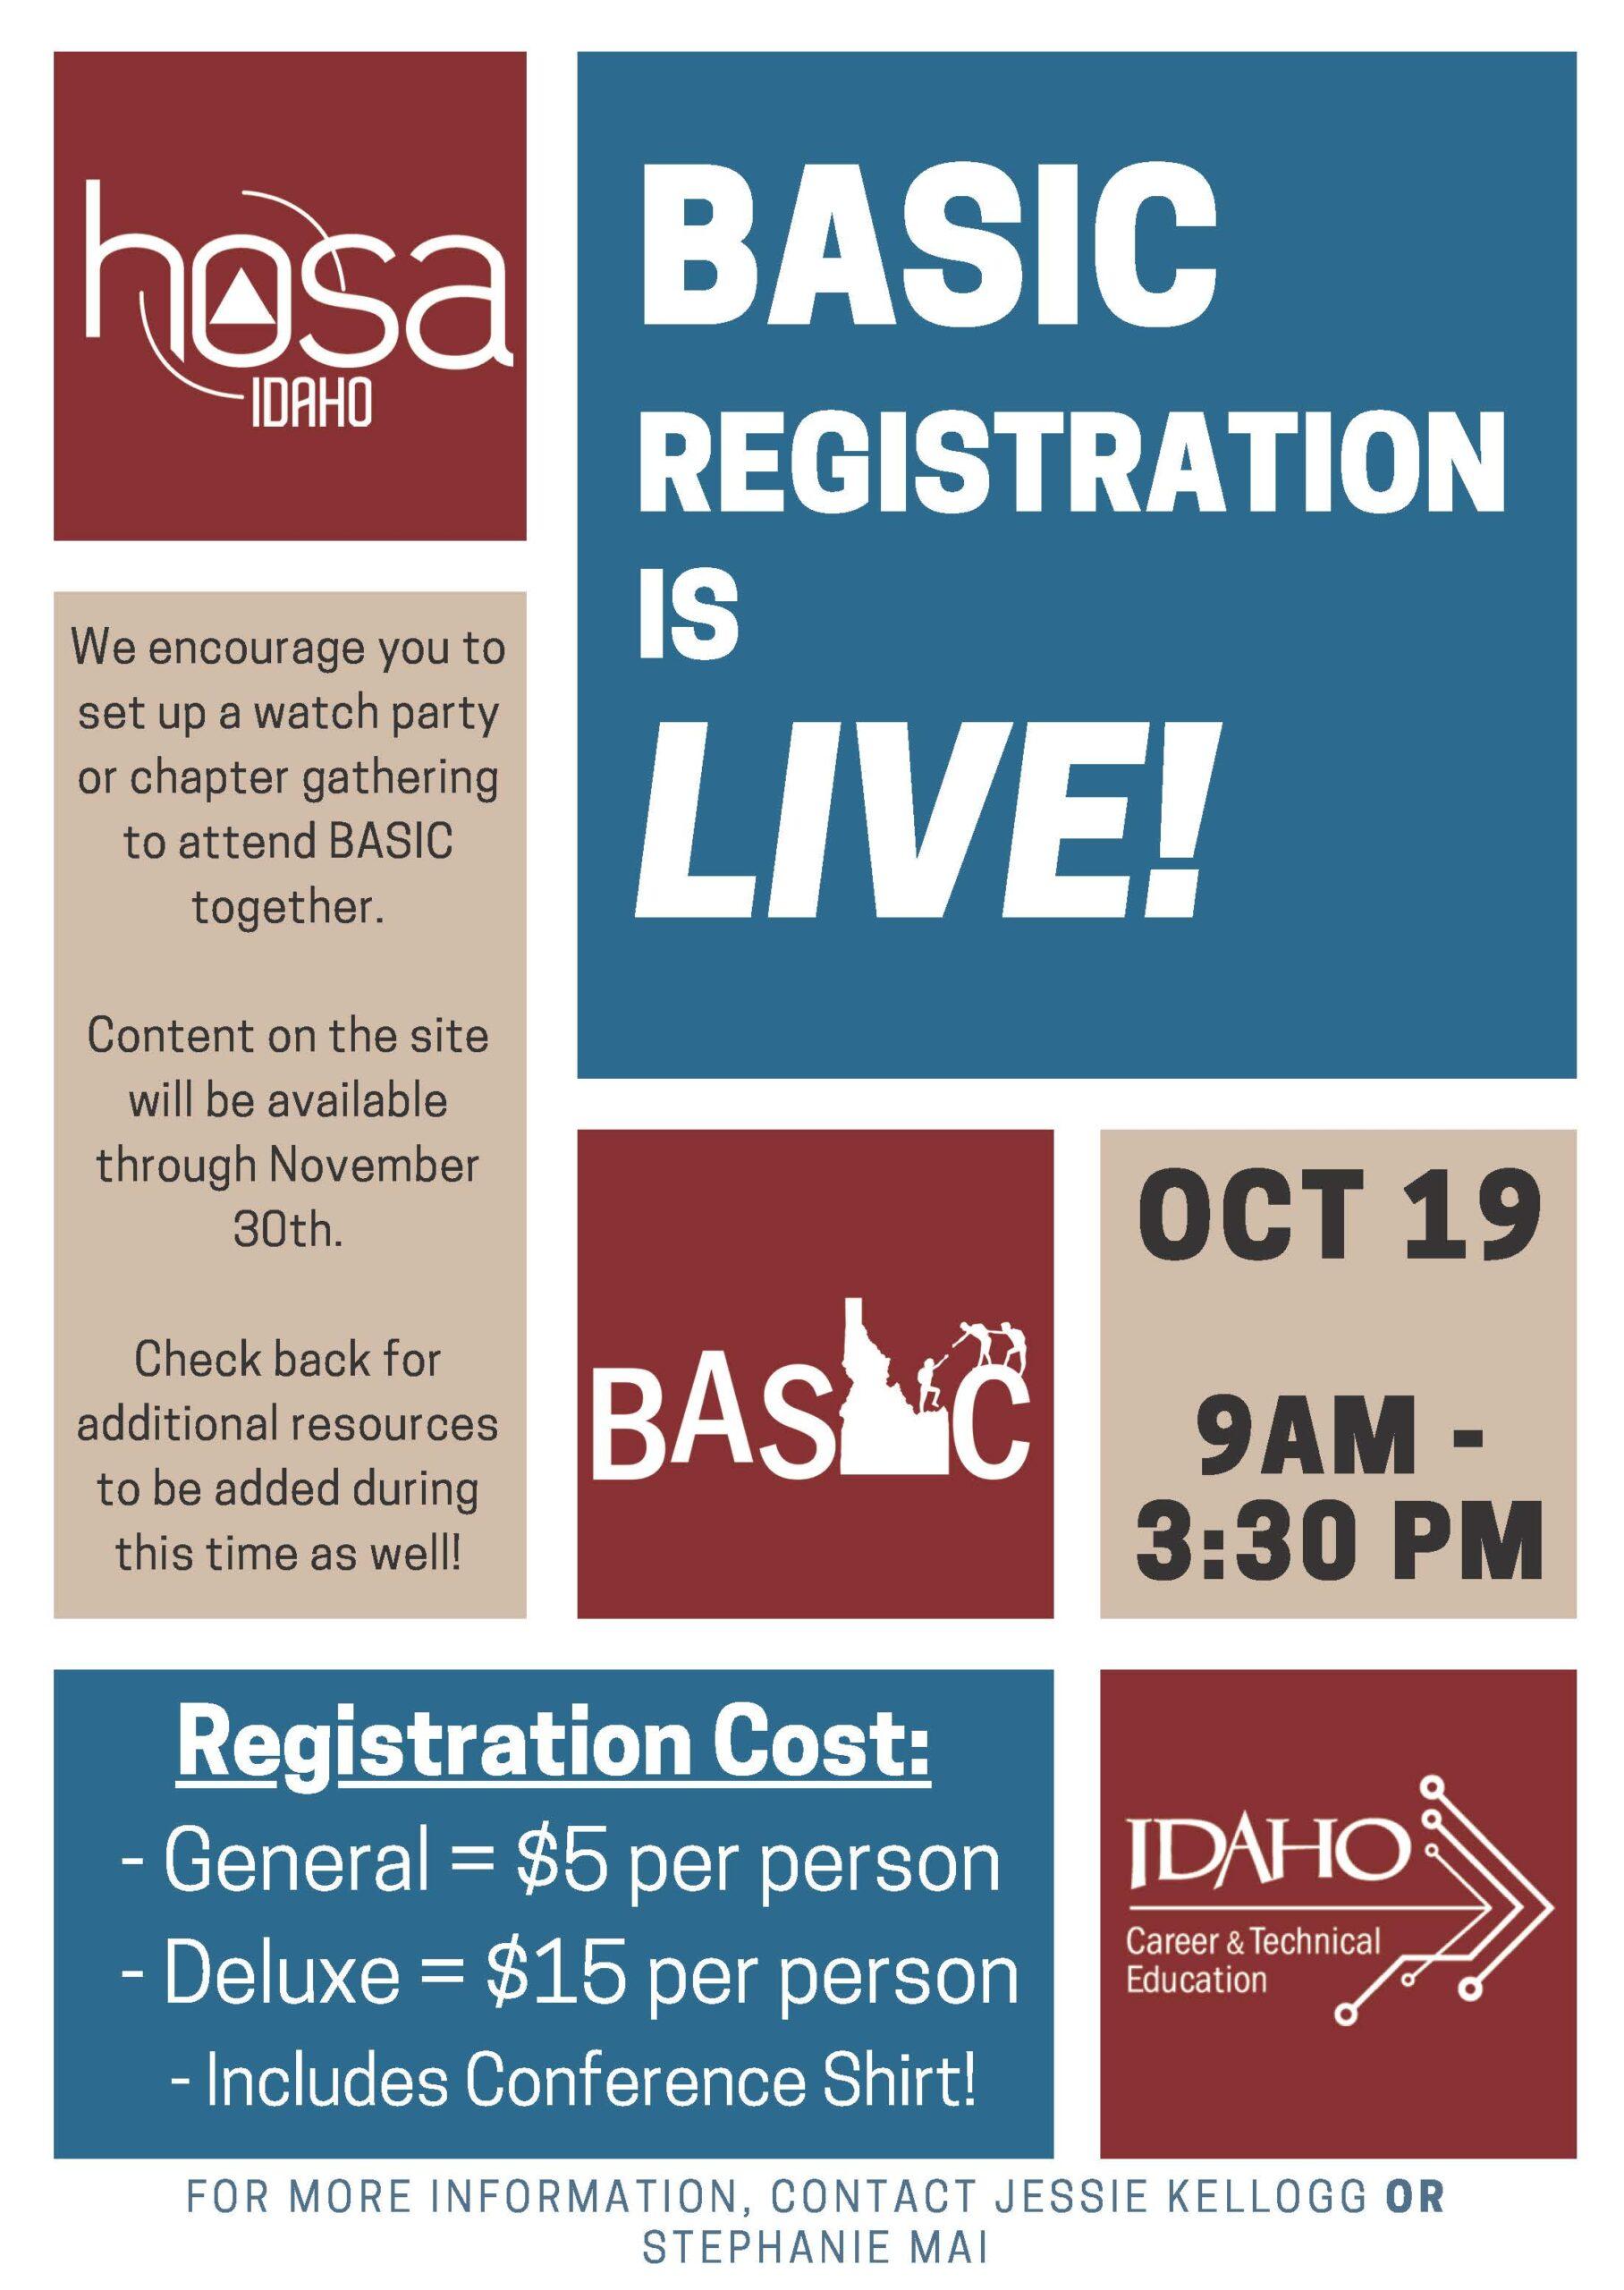 HOSA BASIC Registration Flyer